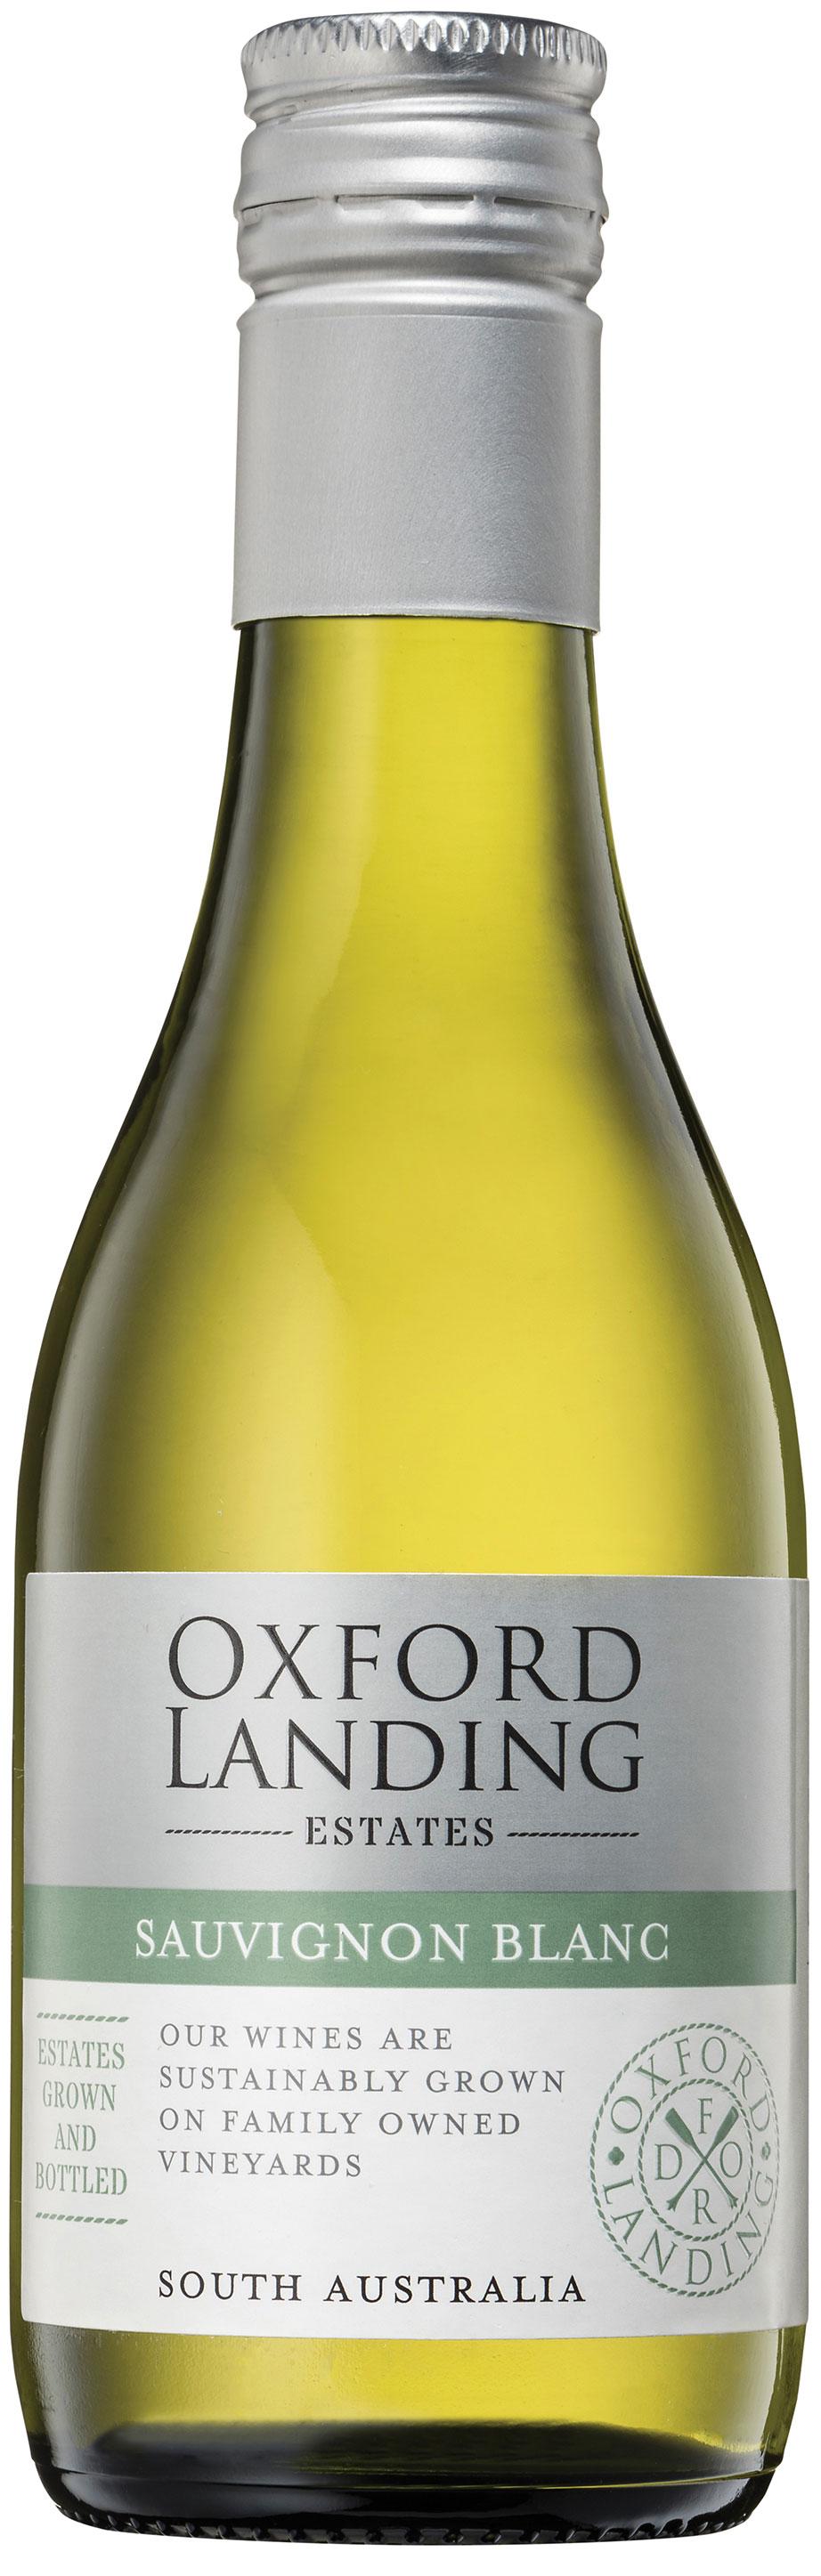 https://vinocorpperu.com/images/vinos/oxfordlanding/oxford_landing_estates_sauvignon_blanc_2017_187.jpg